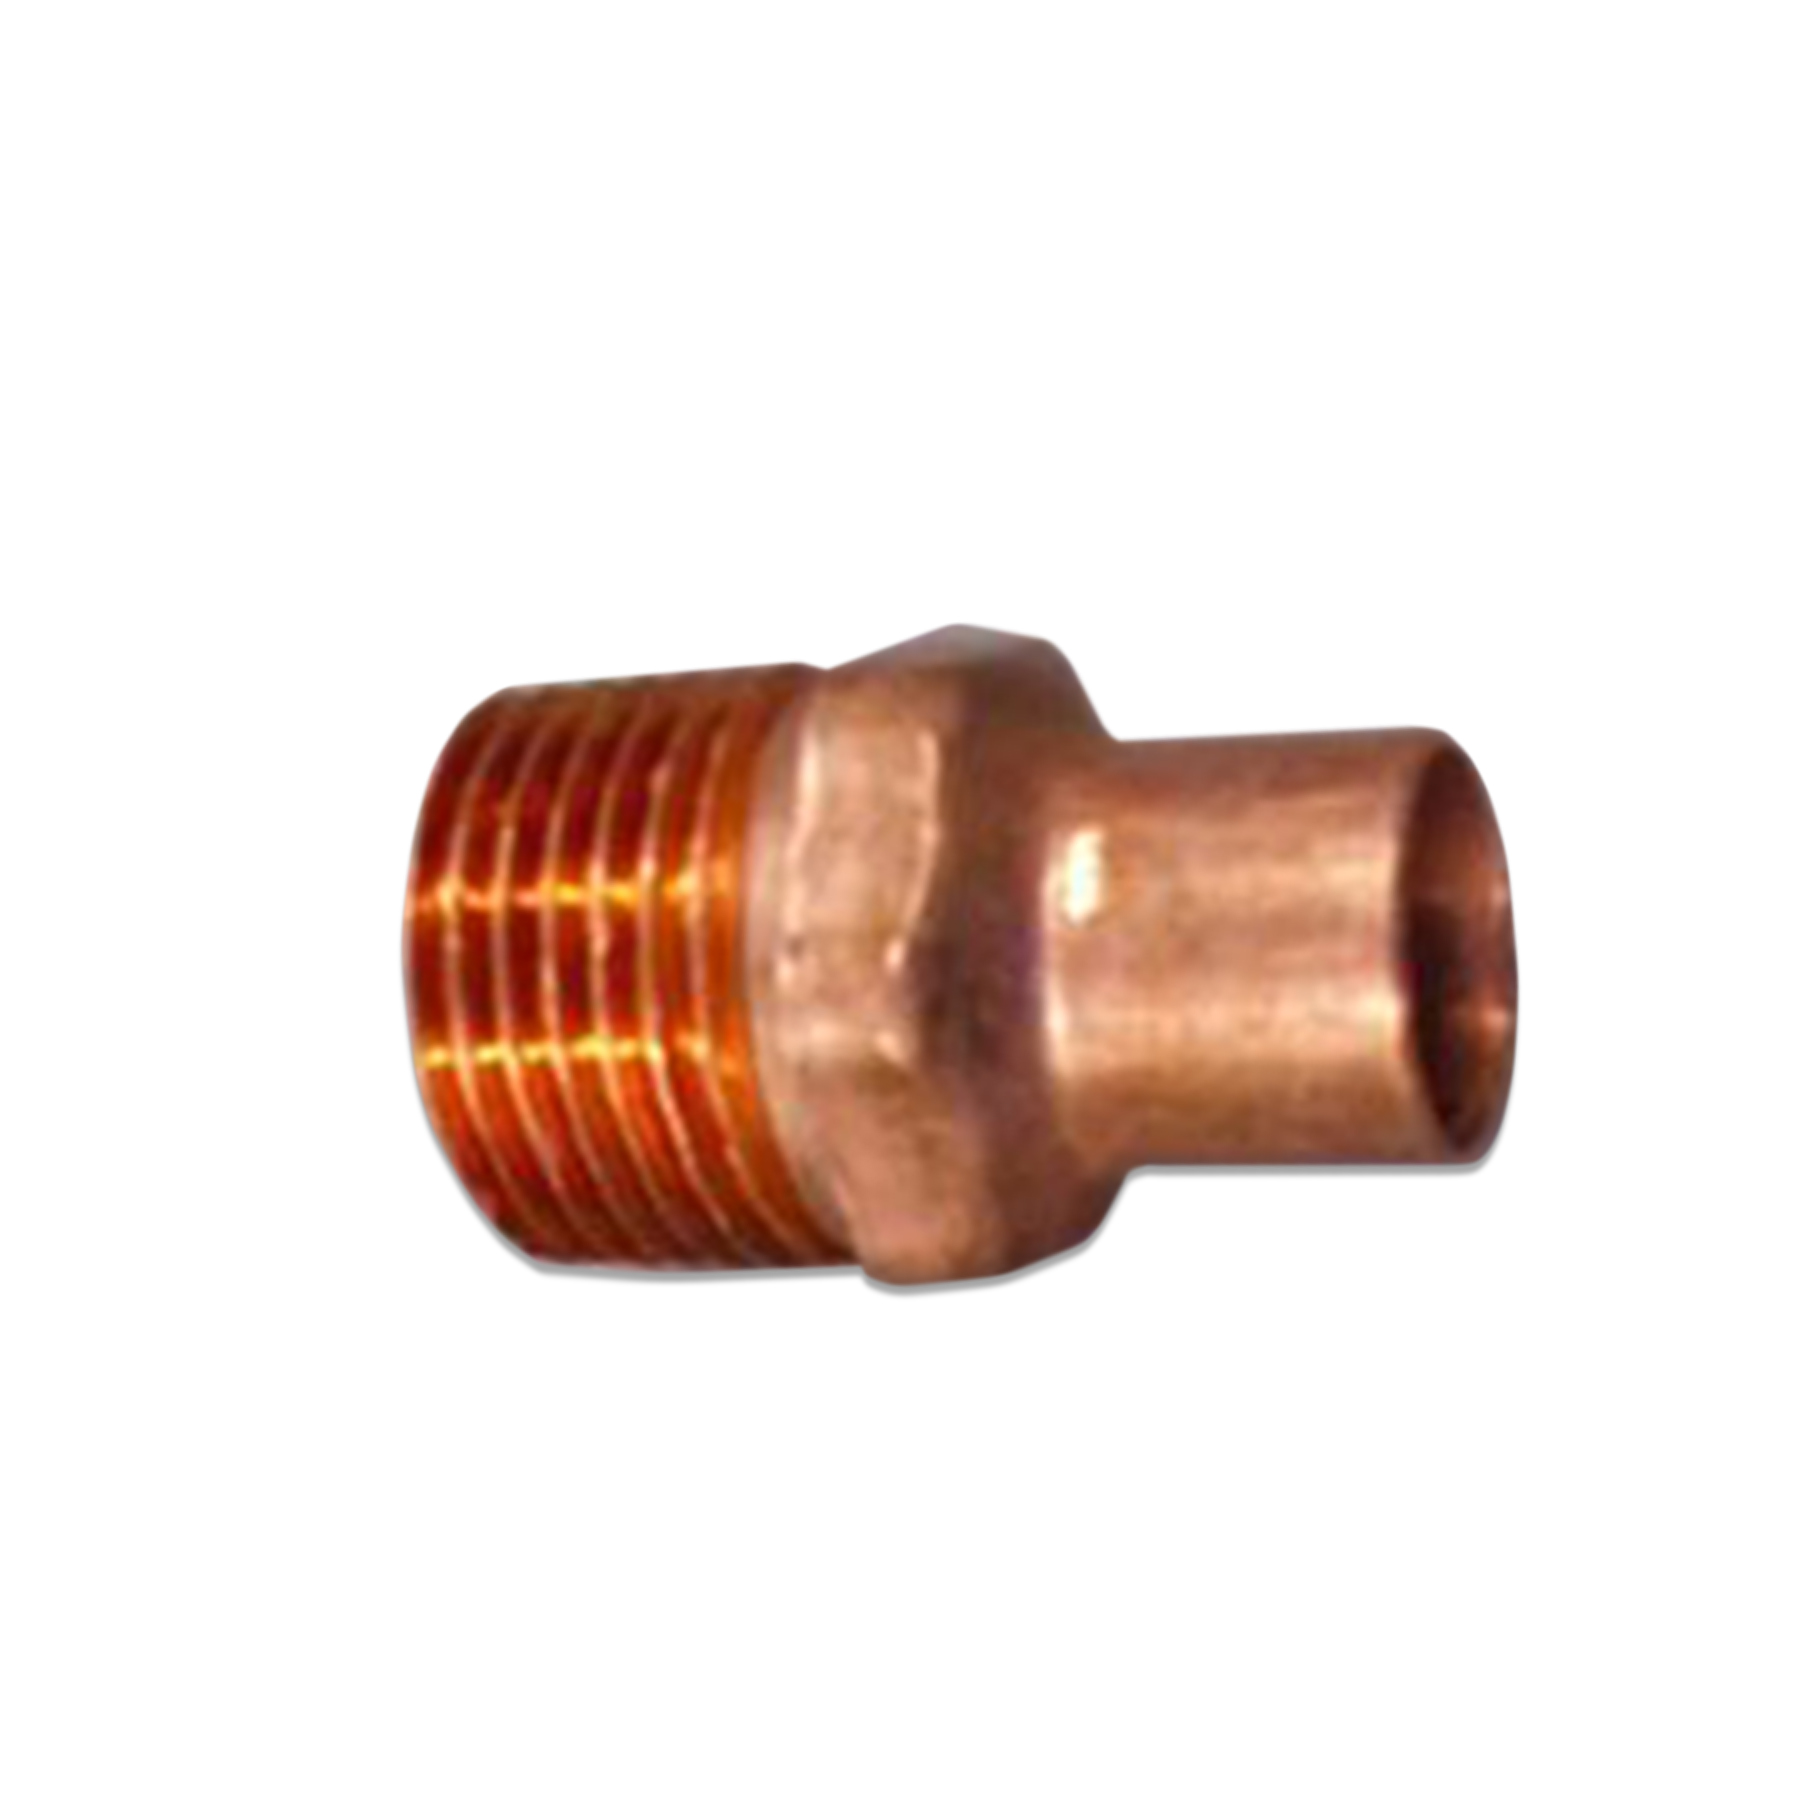 Copper Sweat Fitting 1/2 in. (M) NPT x 1/2 in. ID